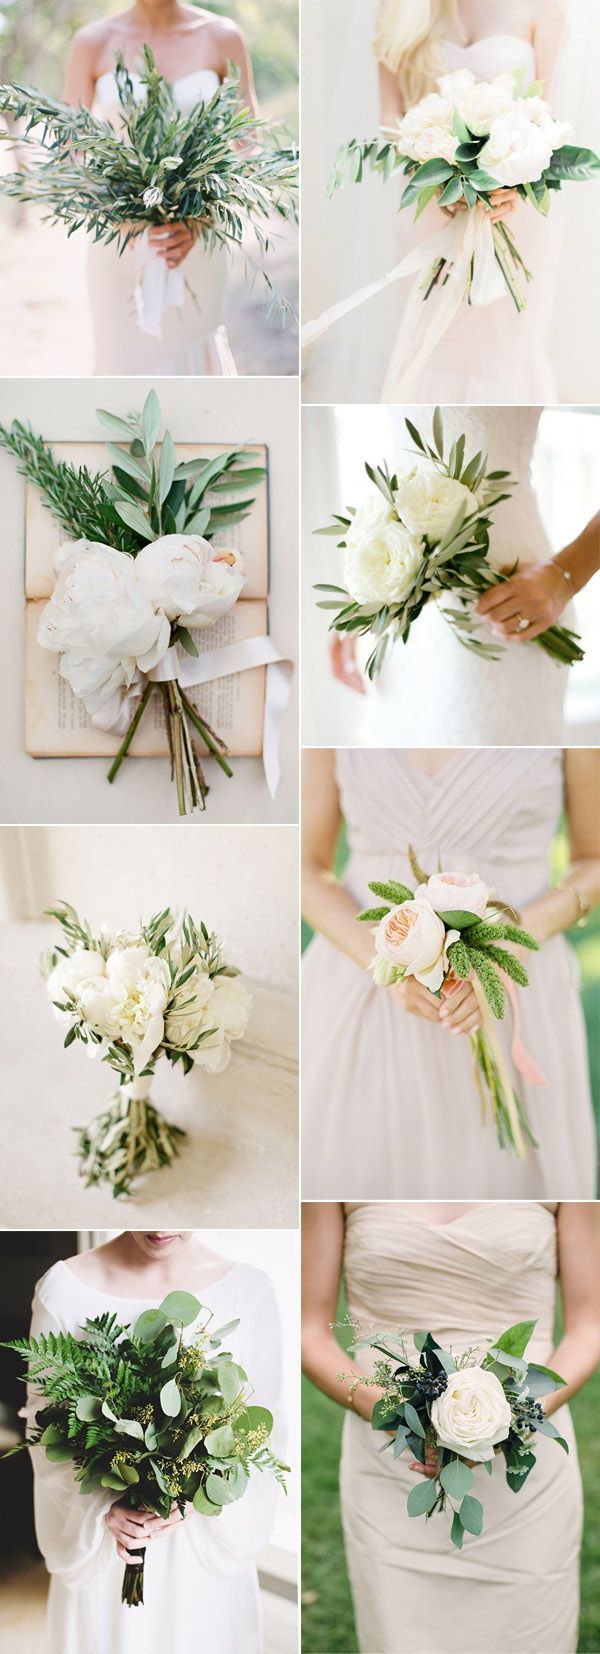 Easy DIY simple botanical greenery wedding bouquets for minimalism